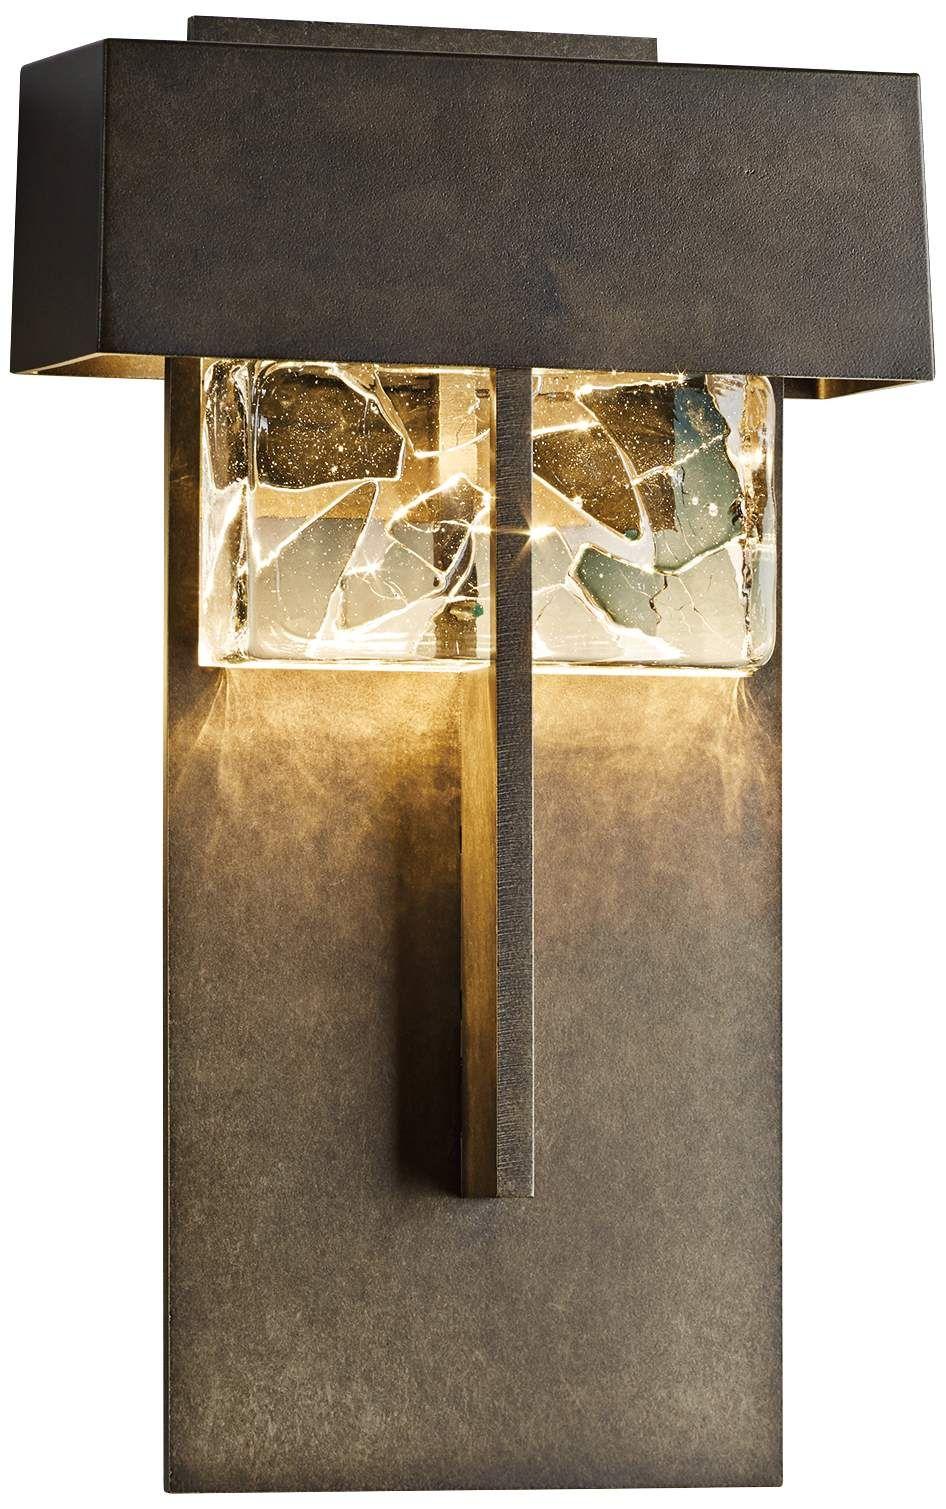 Outdoor Lighting Shard 14 1 4 High Dark Smoke Large Led Outdoor Wall Light Wall Lights Outdoor Sconces Outdoor Wall Lighting